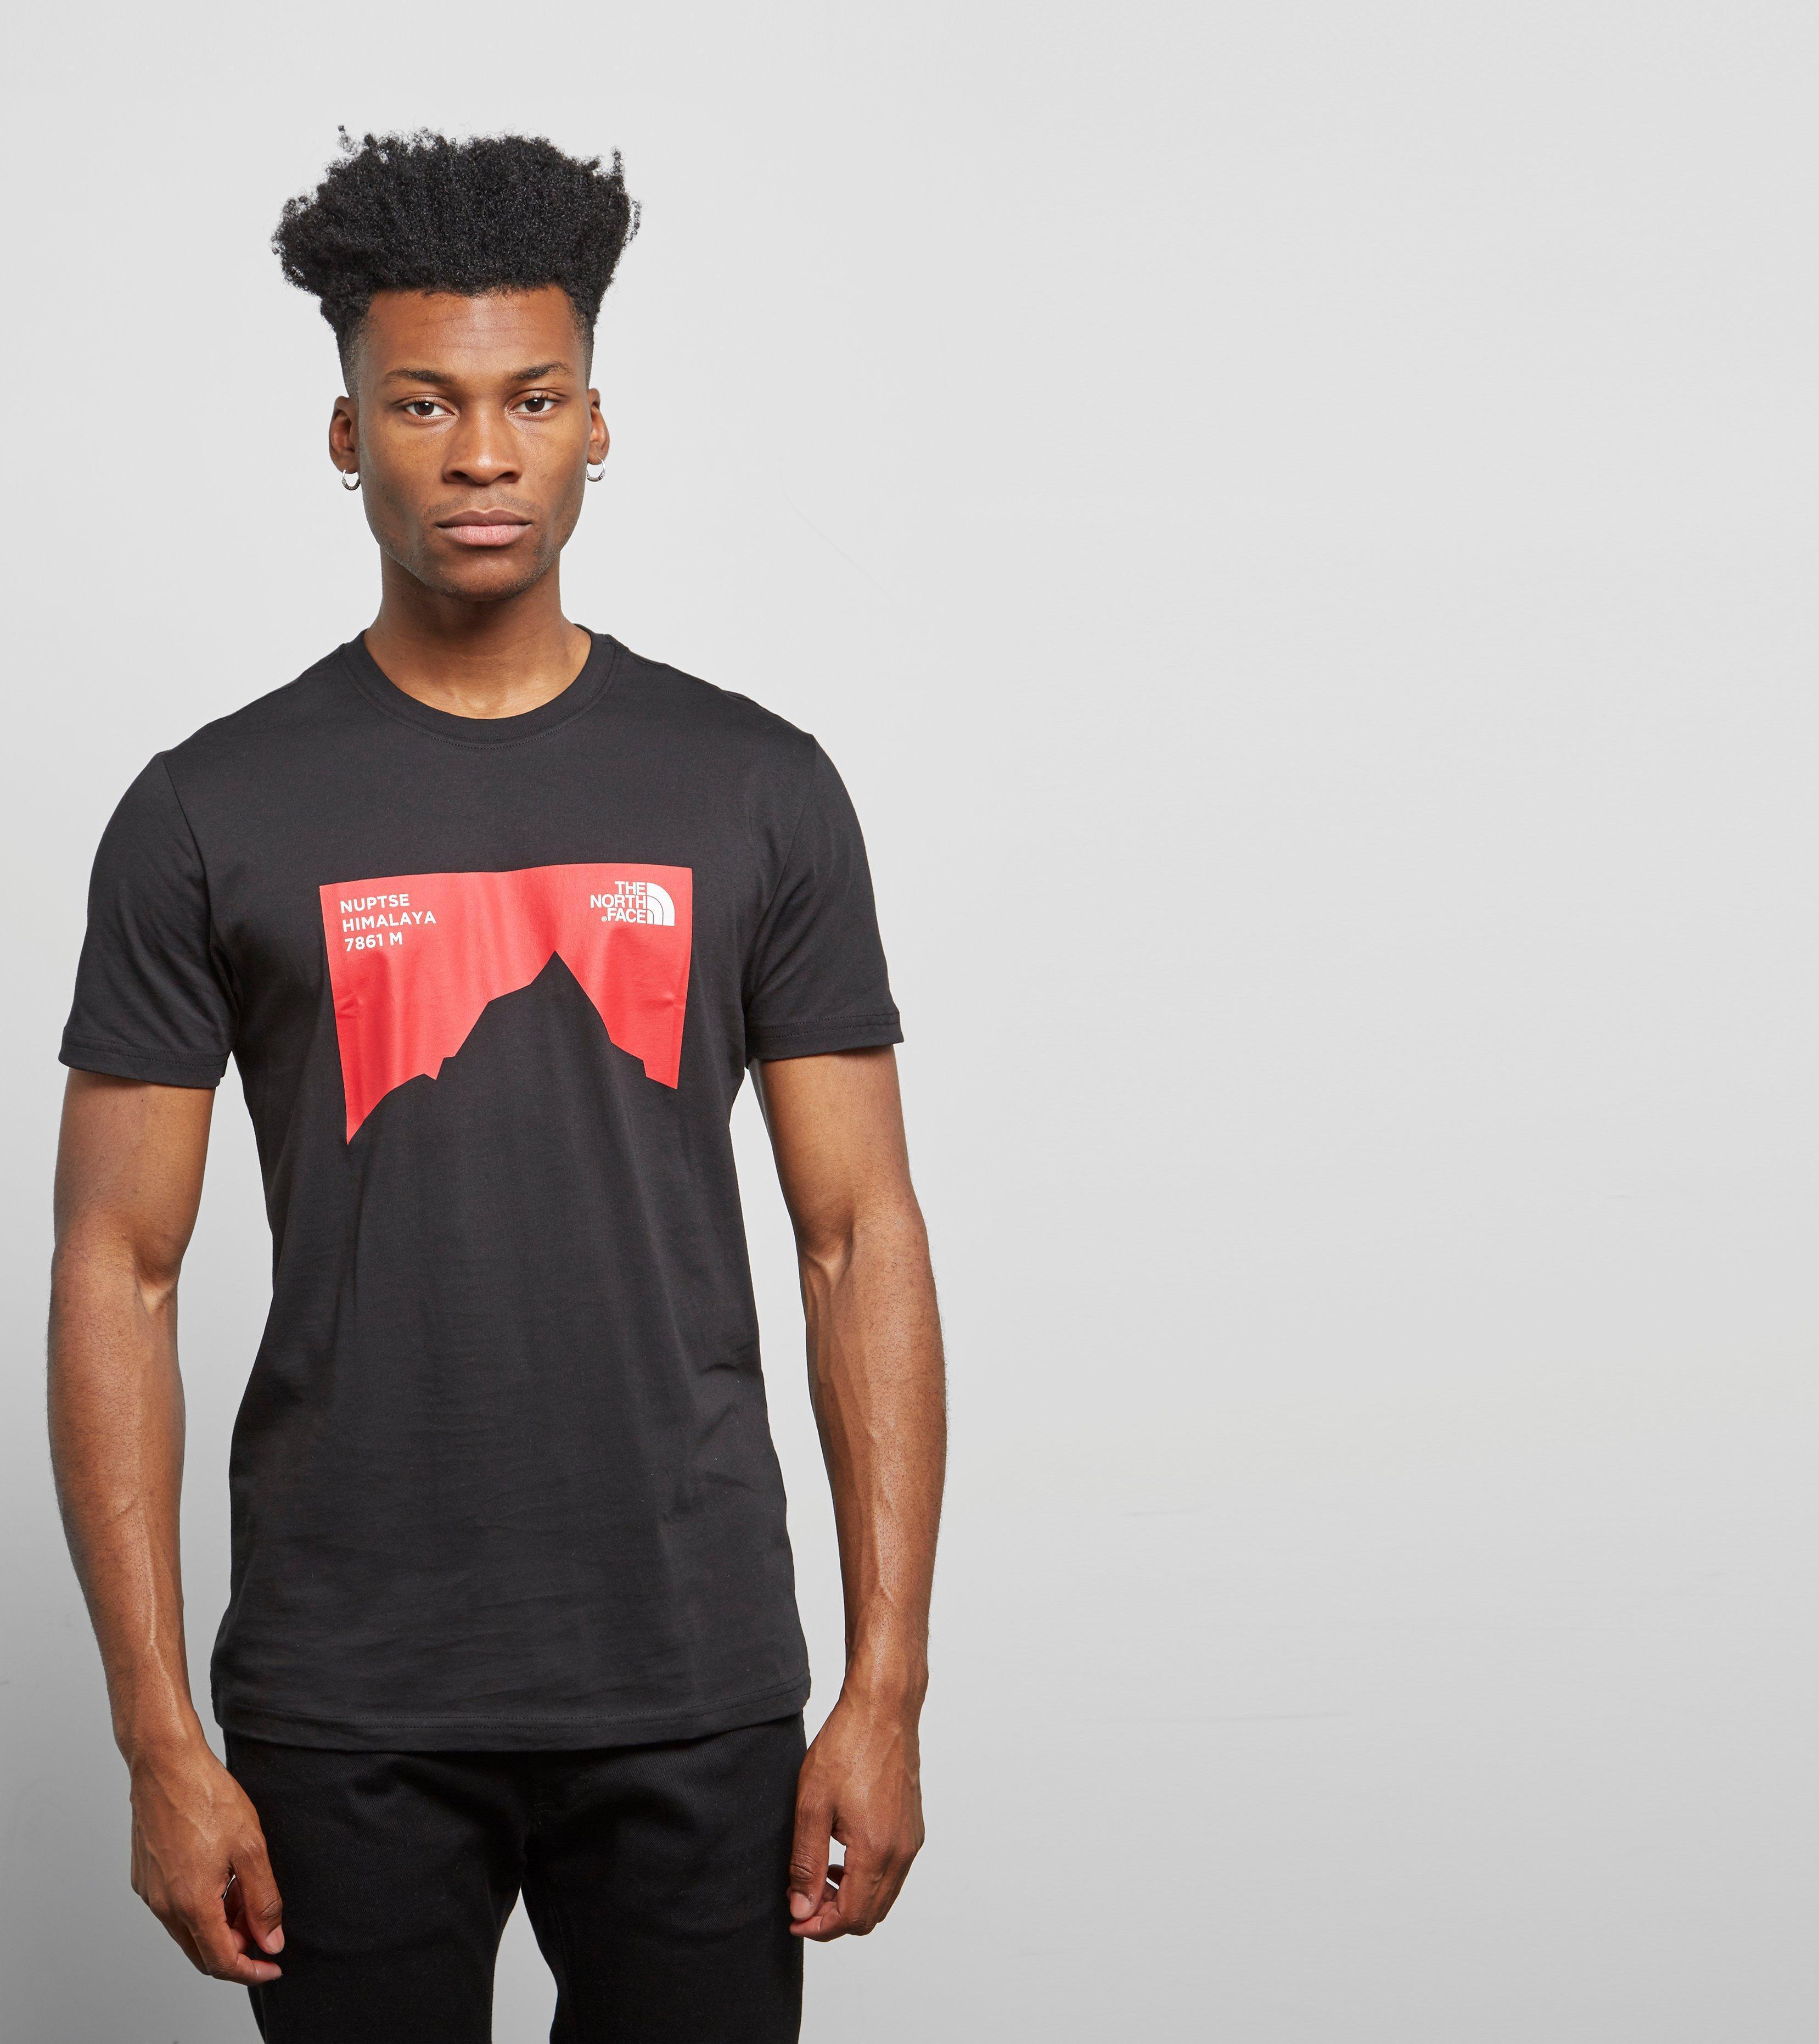 Lyst - The North Face Nuptse Celebration T-shirt in Black for Men 1c47d7e2d